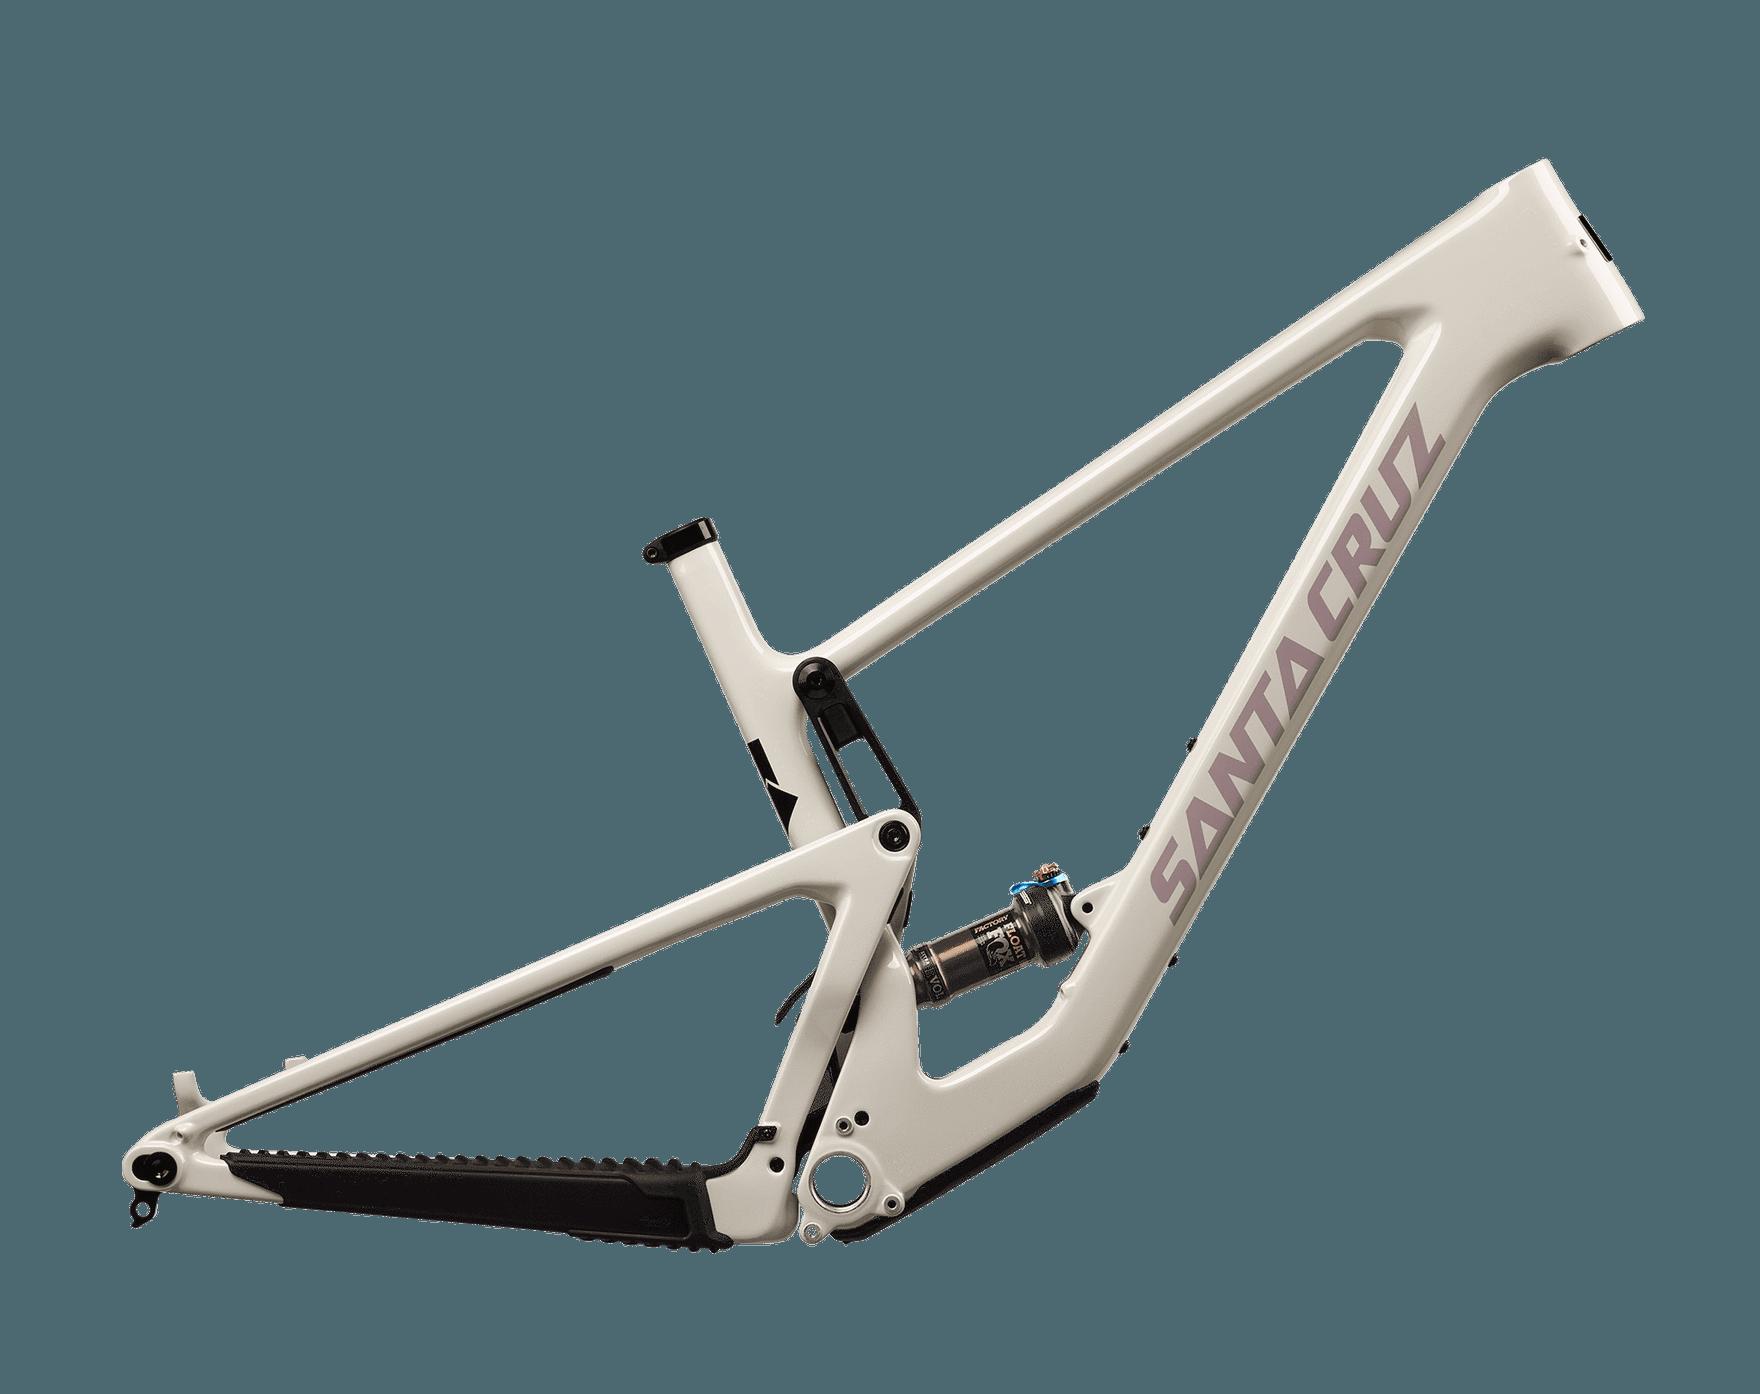 2021 santacruz tallboy cc frame Ivory